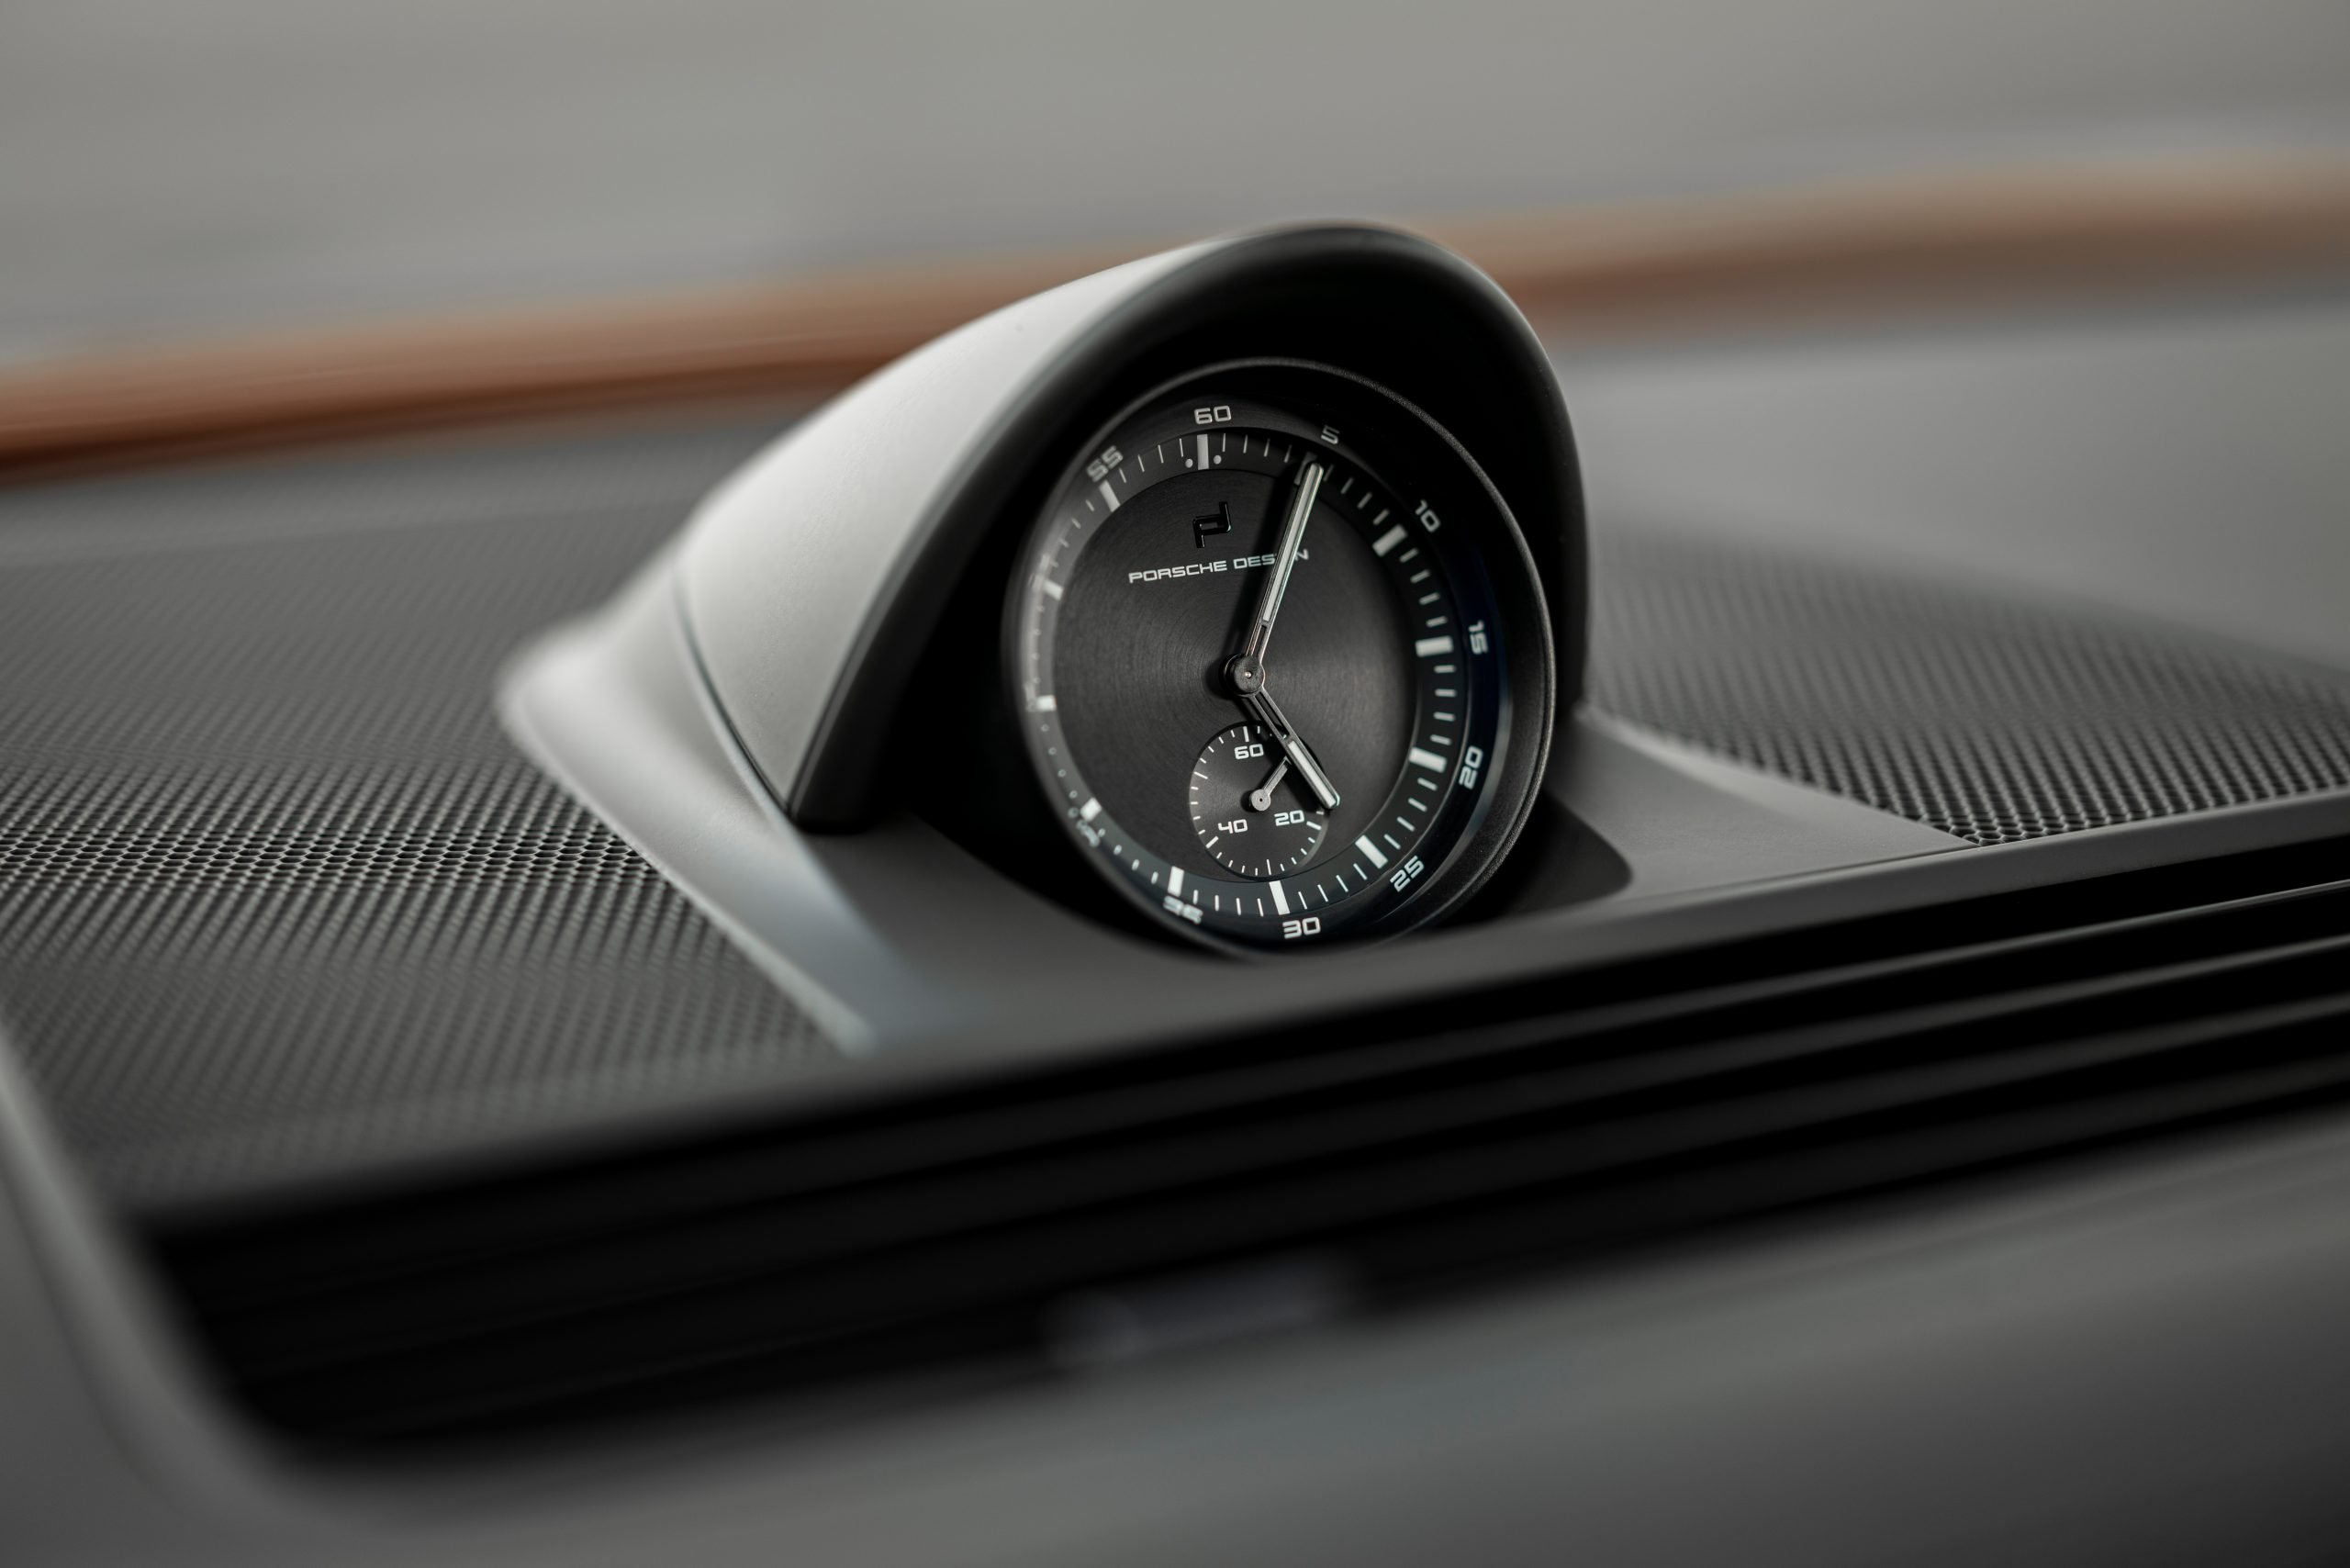 2021 Porsche Panamera Turbo S Stopwatch